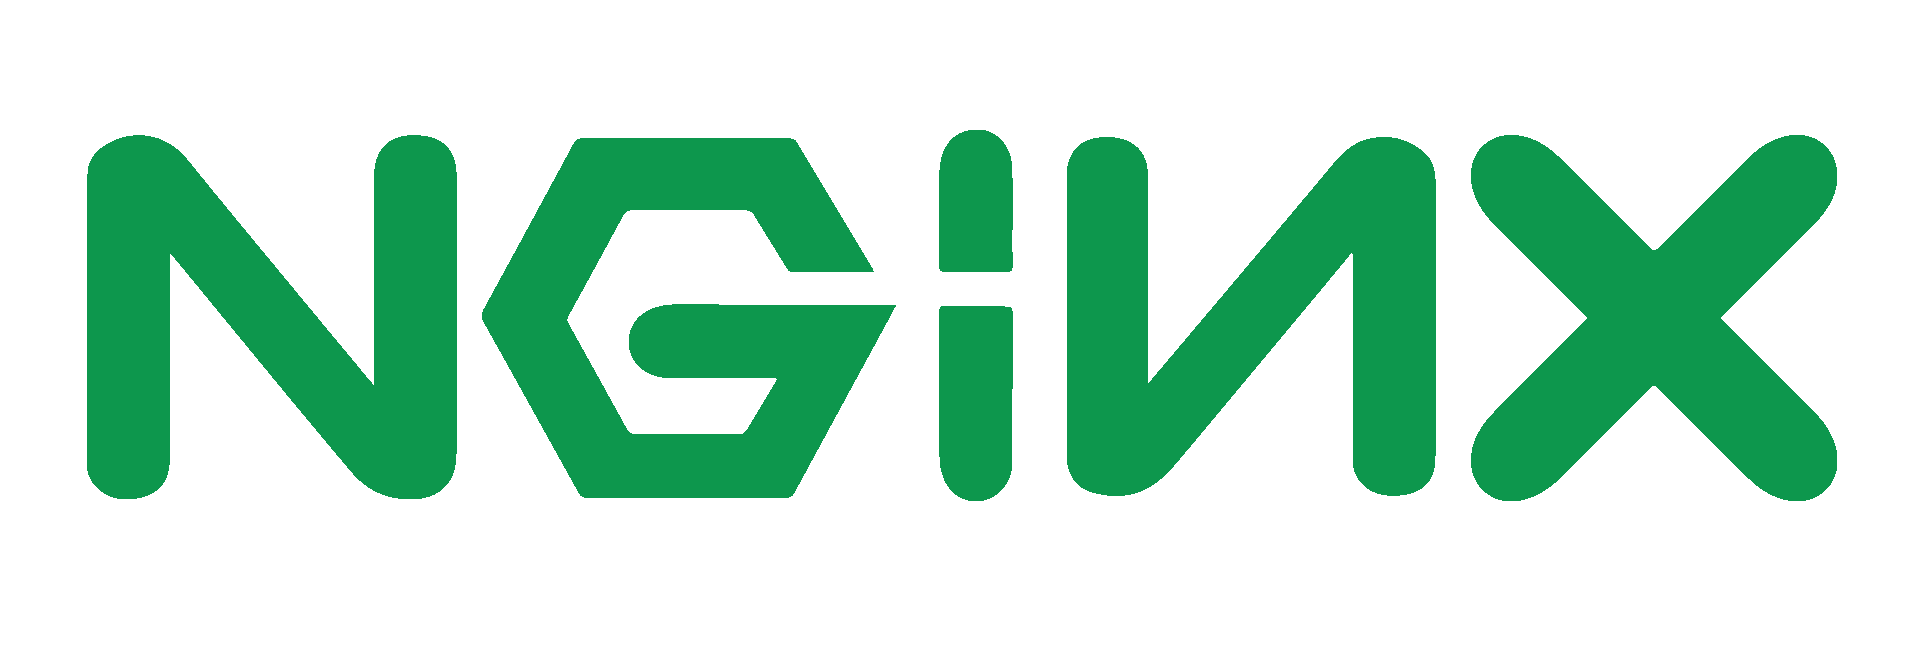 Nginx Dasar : #2 Menambahkan Virtual Host ( Server Blocks) Nginx